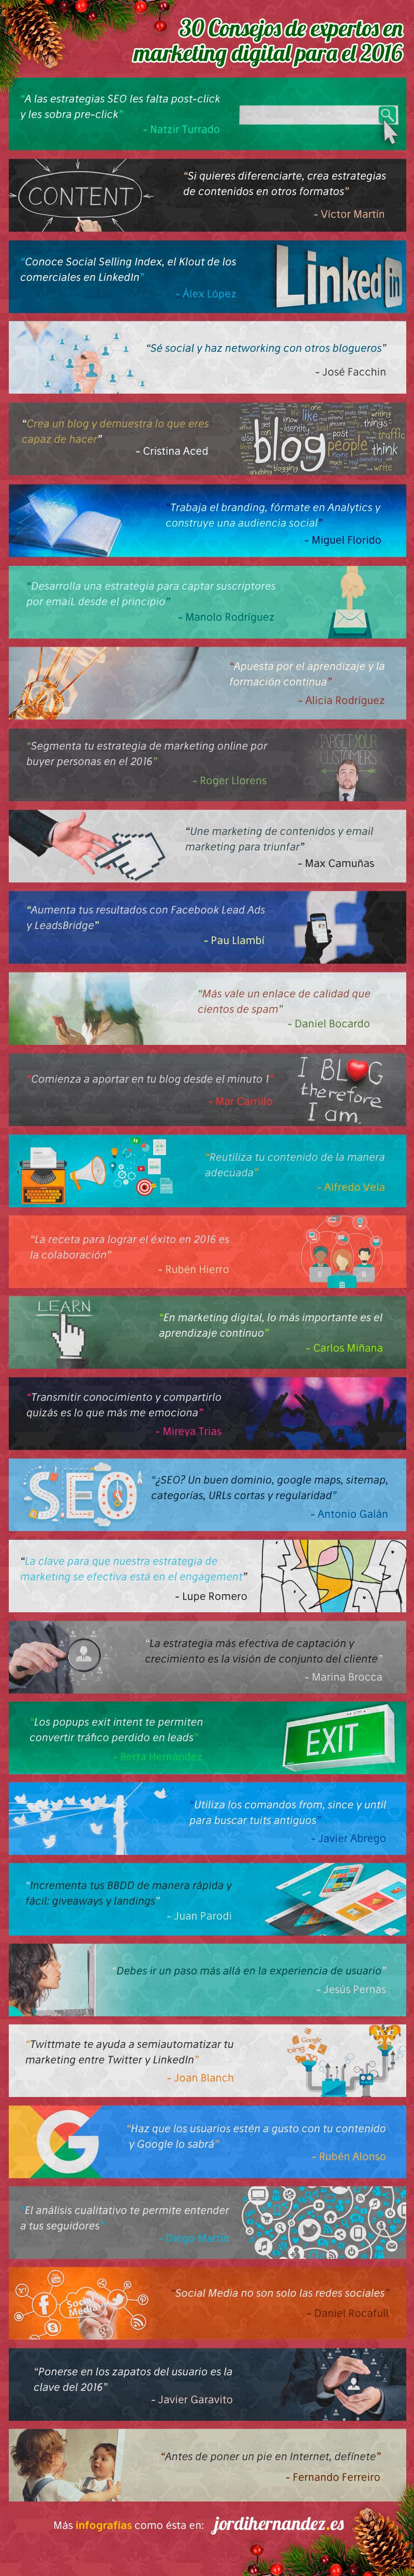 30 consejos de expertos sobre Marketing Digital